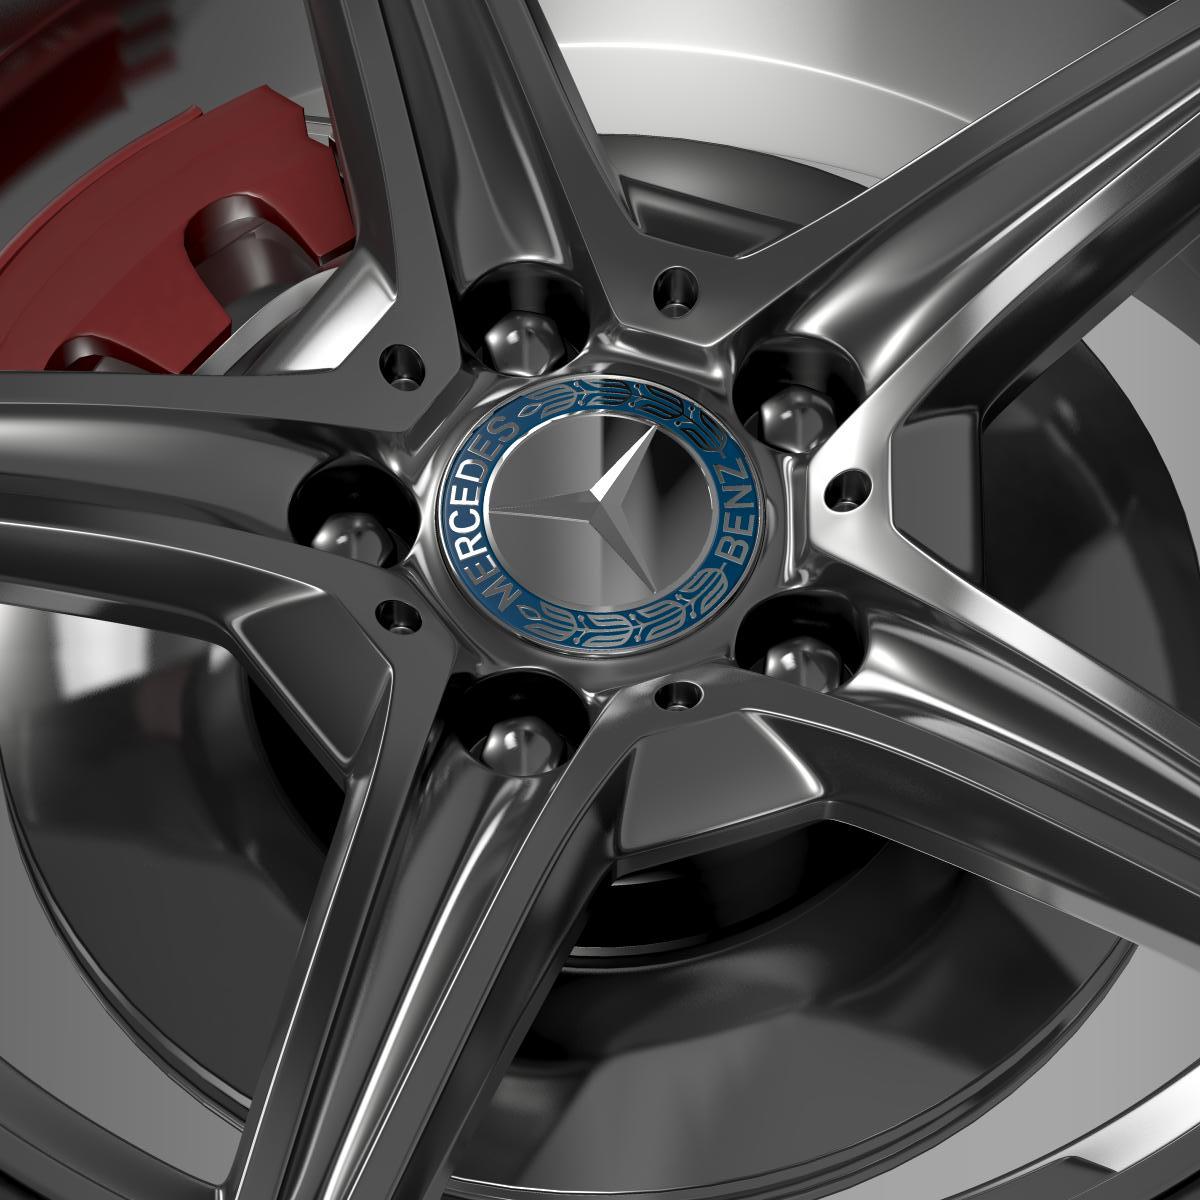 mercedes benz c 400 4matic amg line wheel 3d model 3ds max fbx c4d lwo ma mb hrc xsi obj 210789